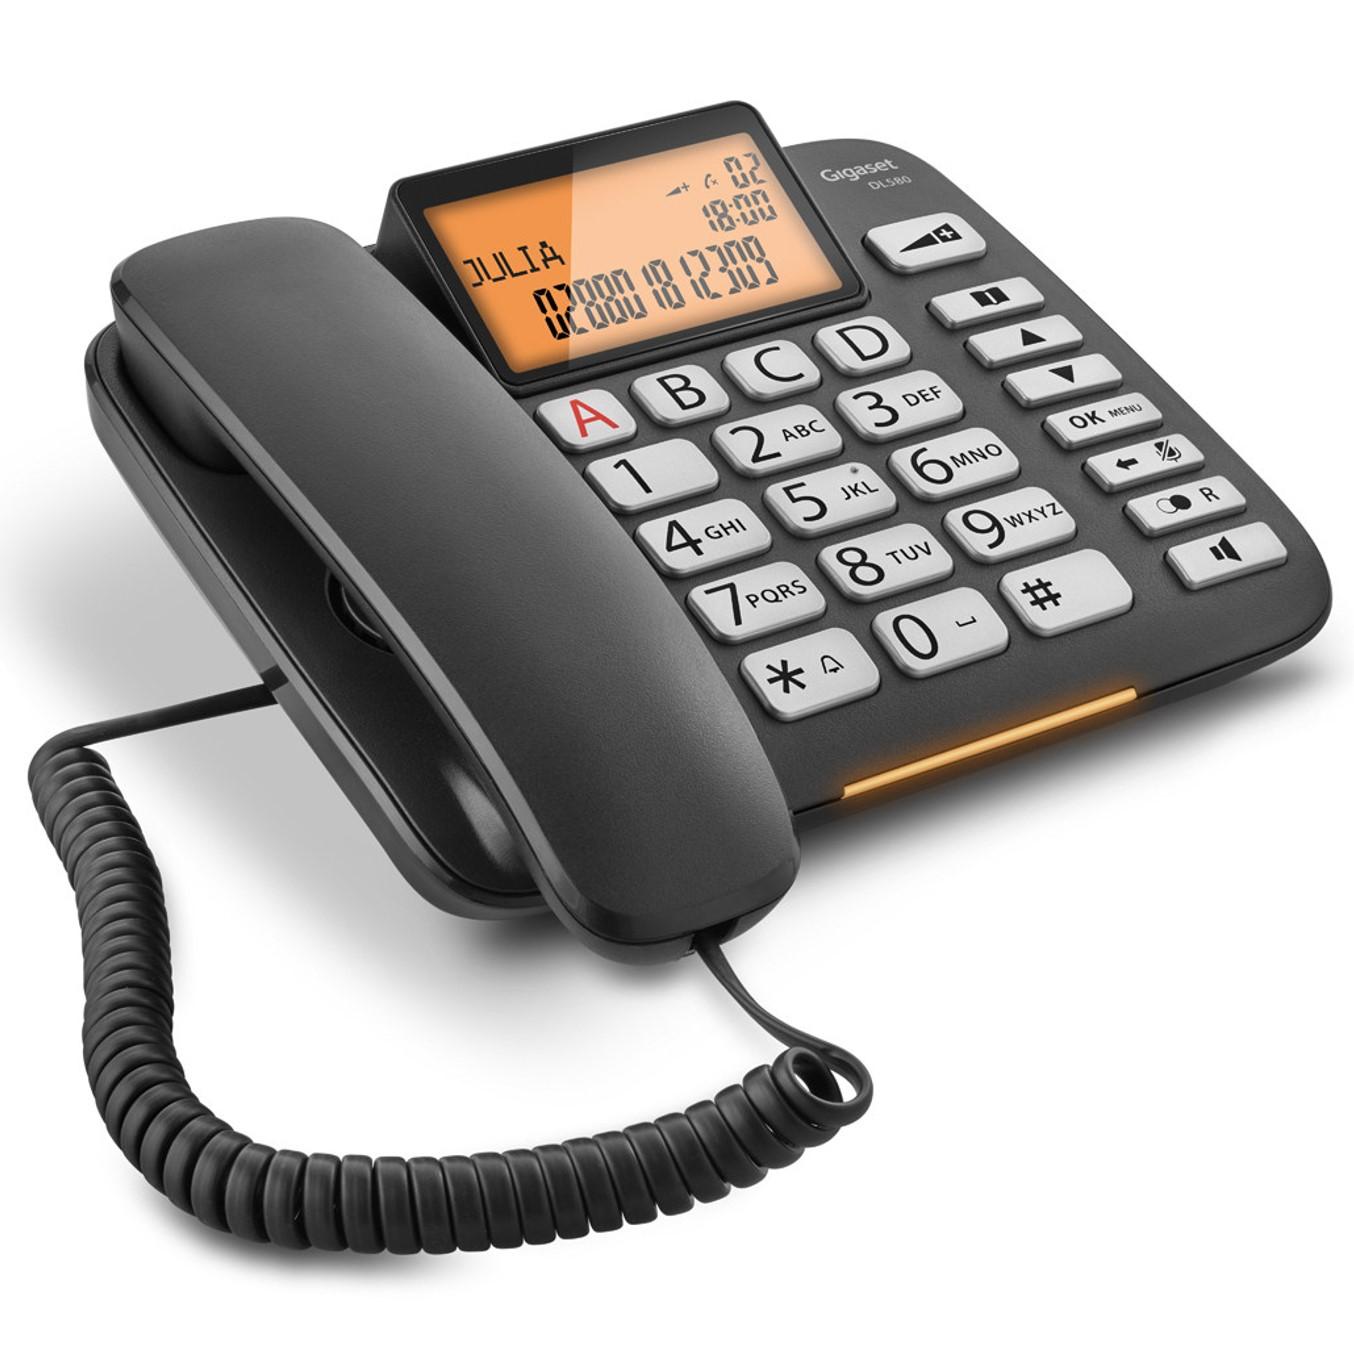 TELEFONO FIJO GIGASET DL580 NEGRO 99 NUMEROS AGENDA/ 10 TONOS